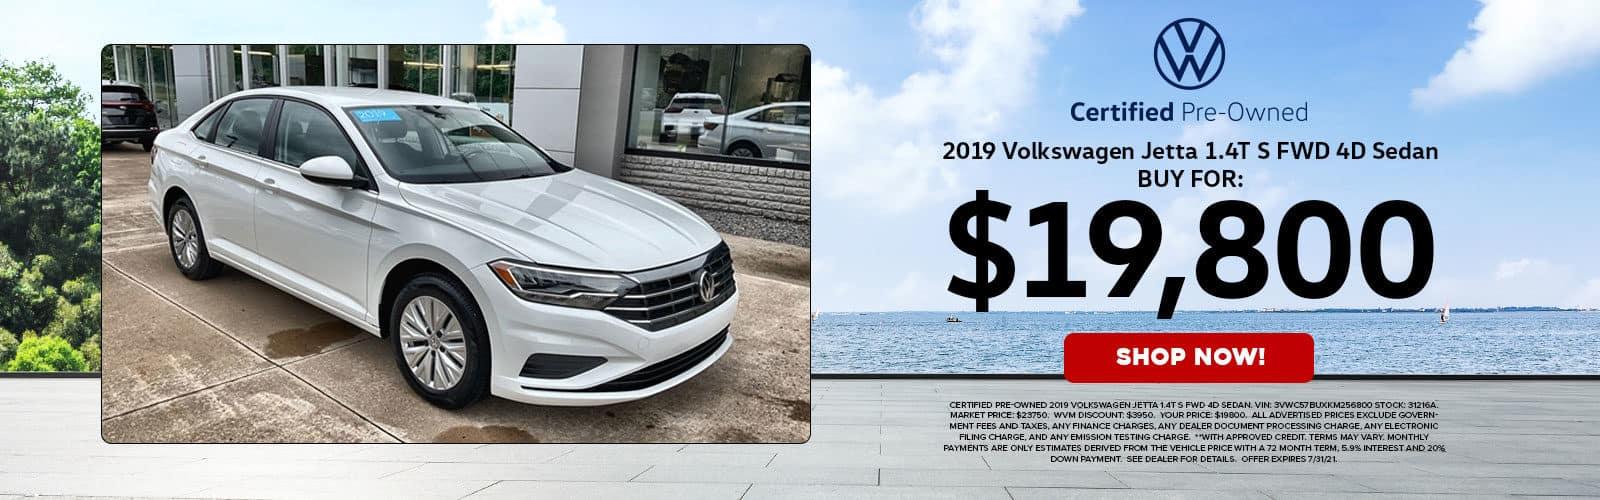 7_21_Wyoming_Valley_VW-2019-JETTA-S